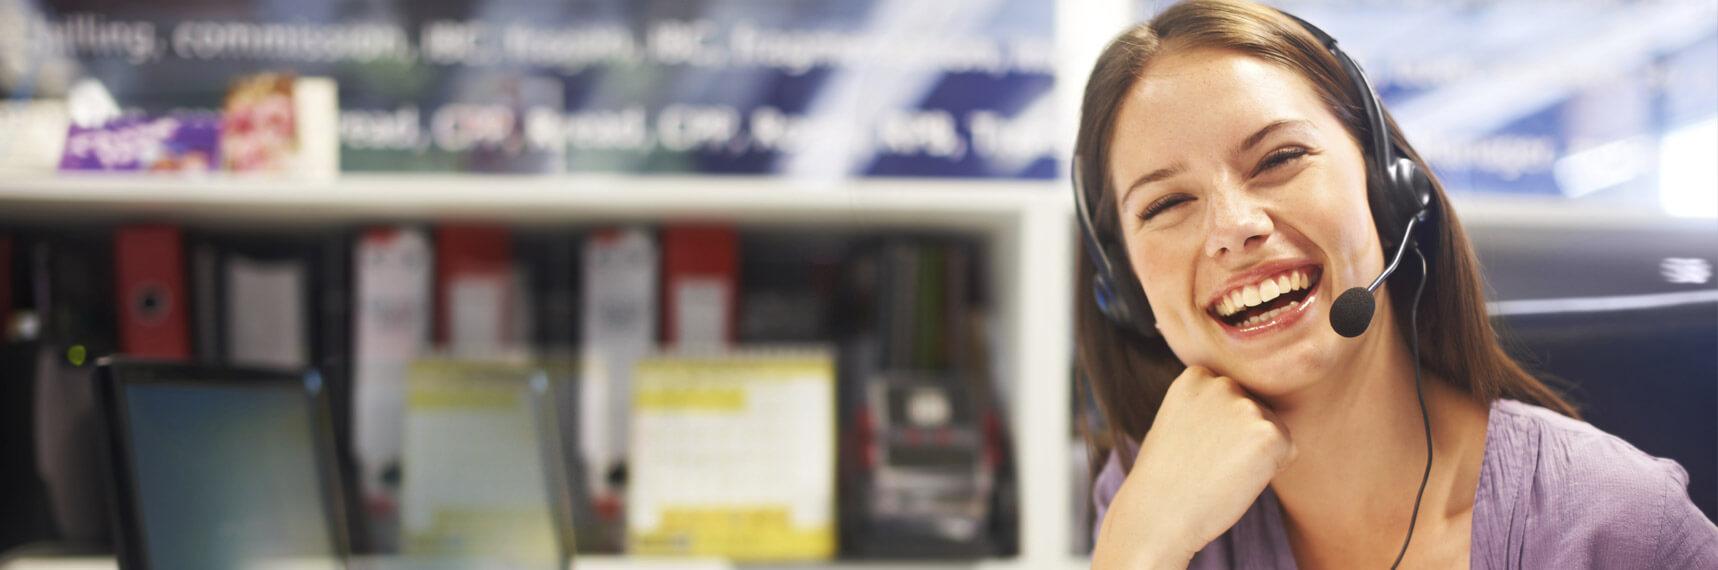 CVS customer service